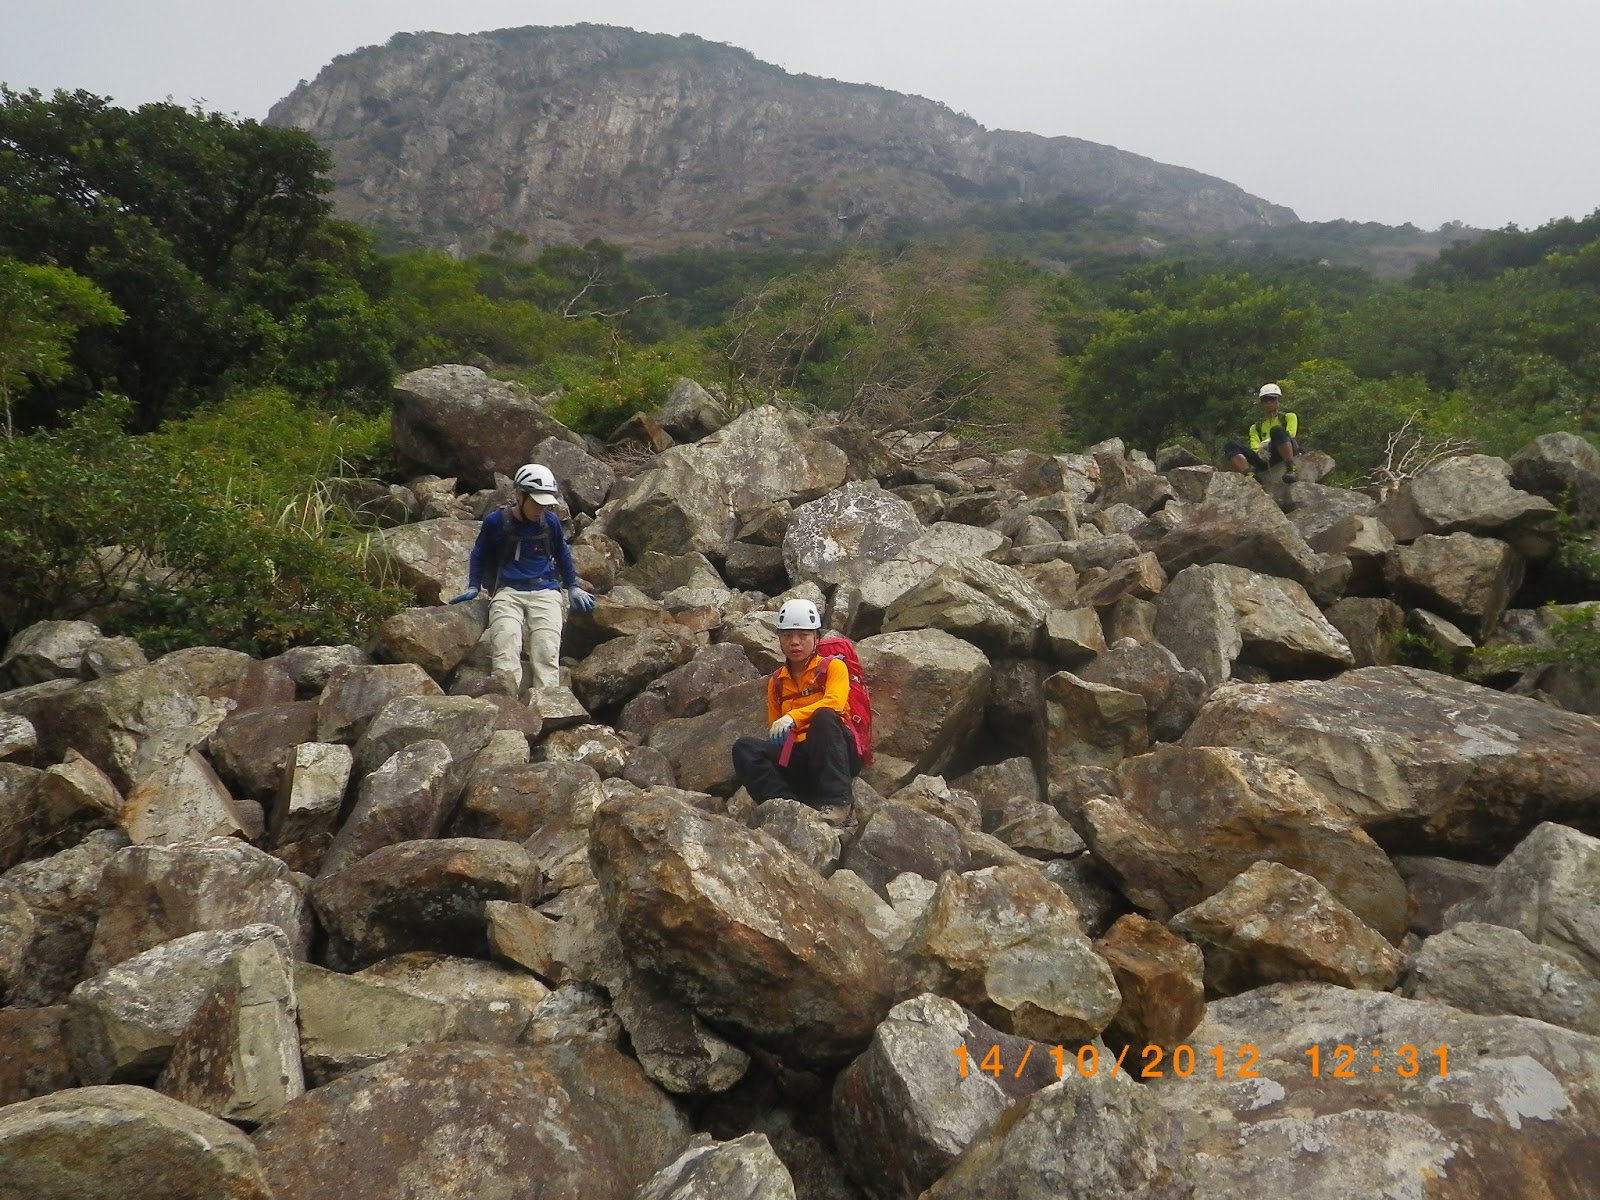 Danny: 2012-10-14 : 倒腕崖。倒腕石河